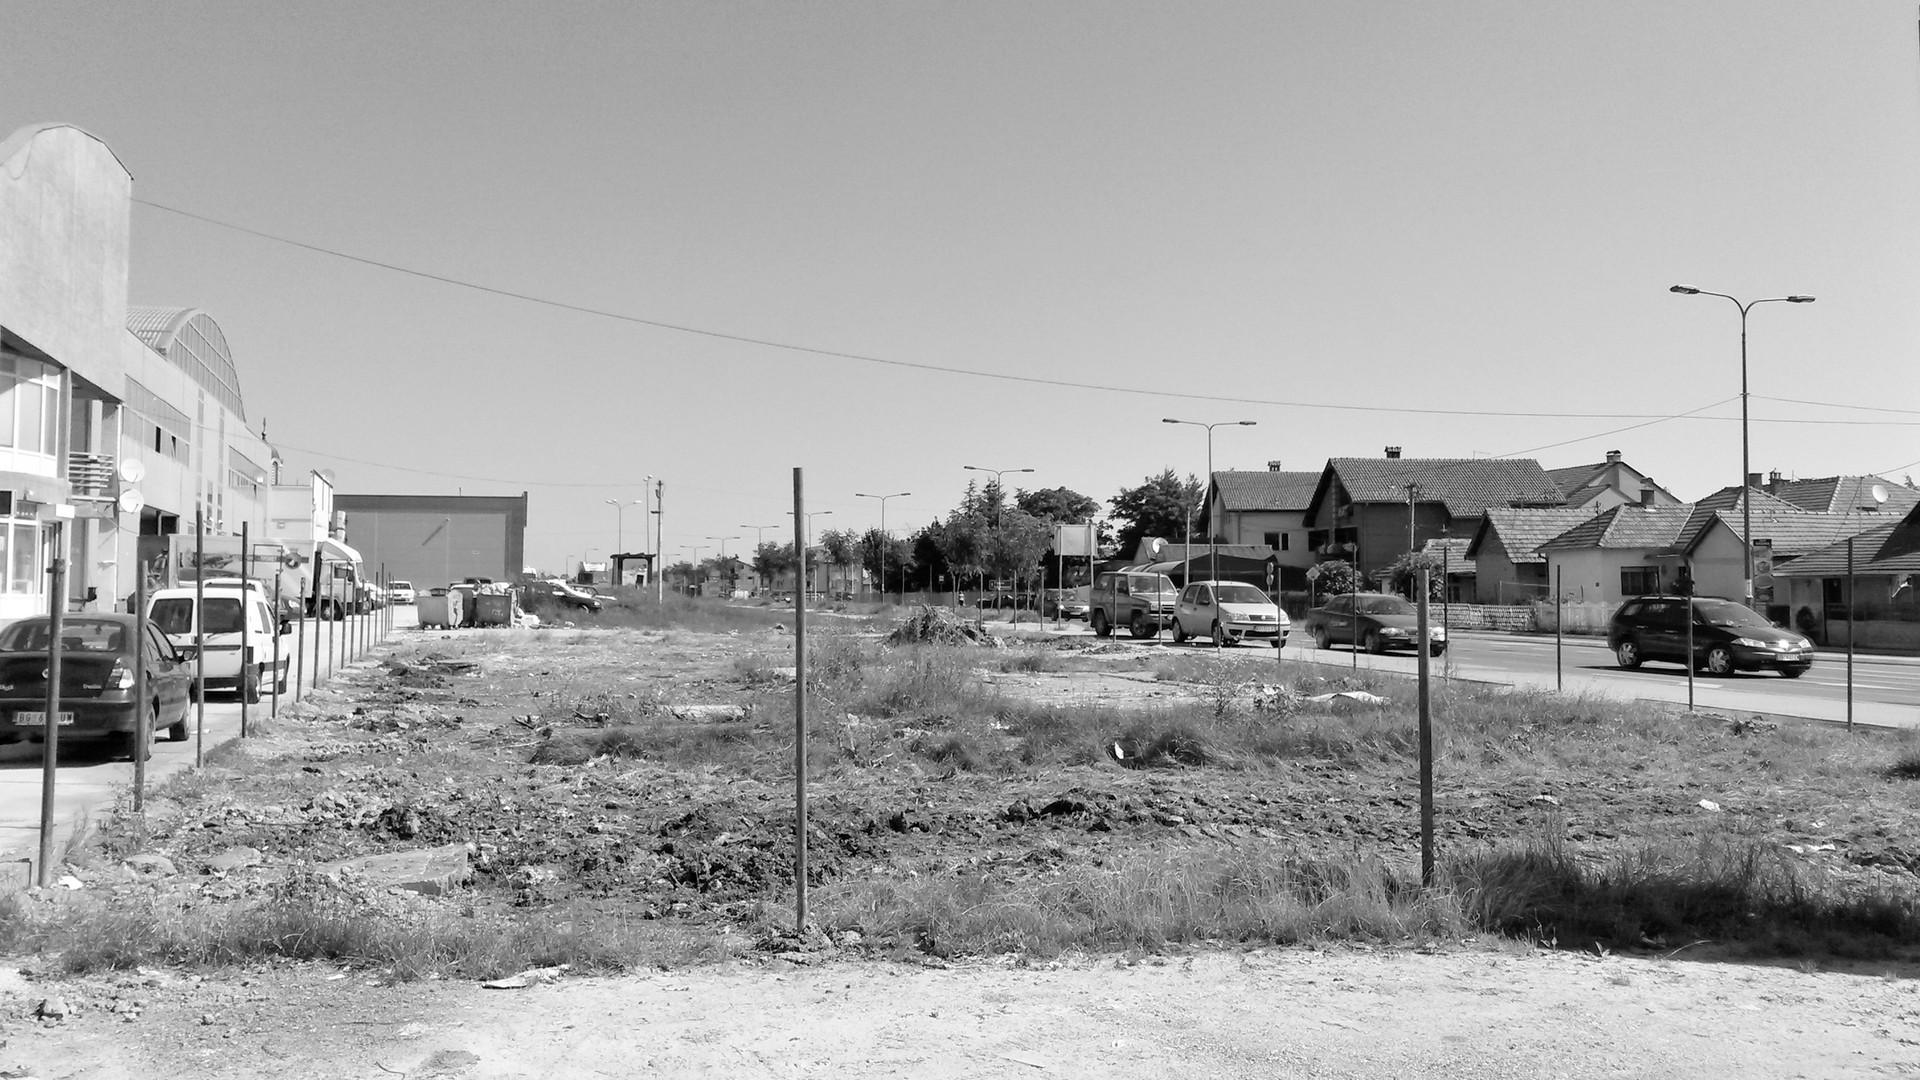 s-before-primus_panorama-03.jpg